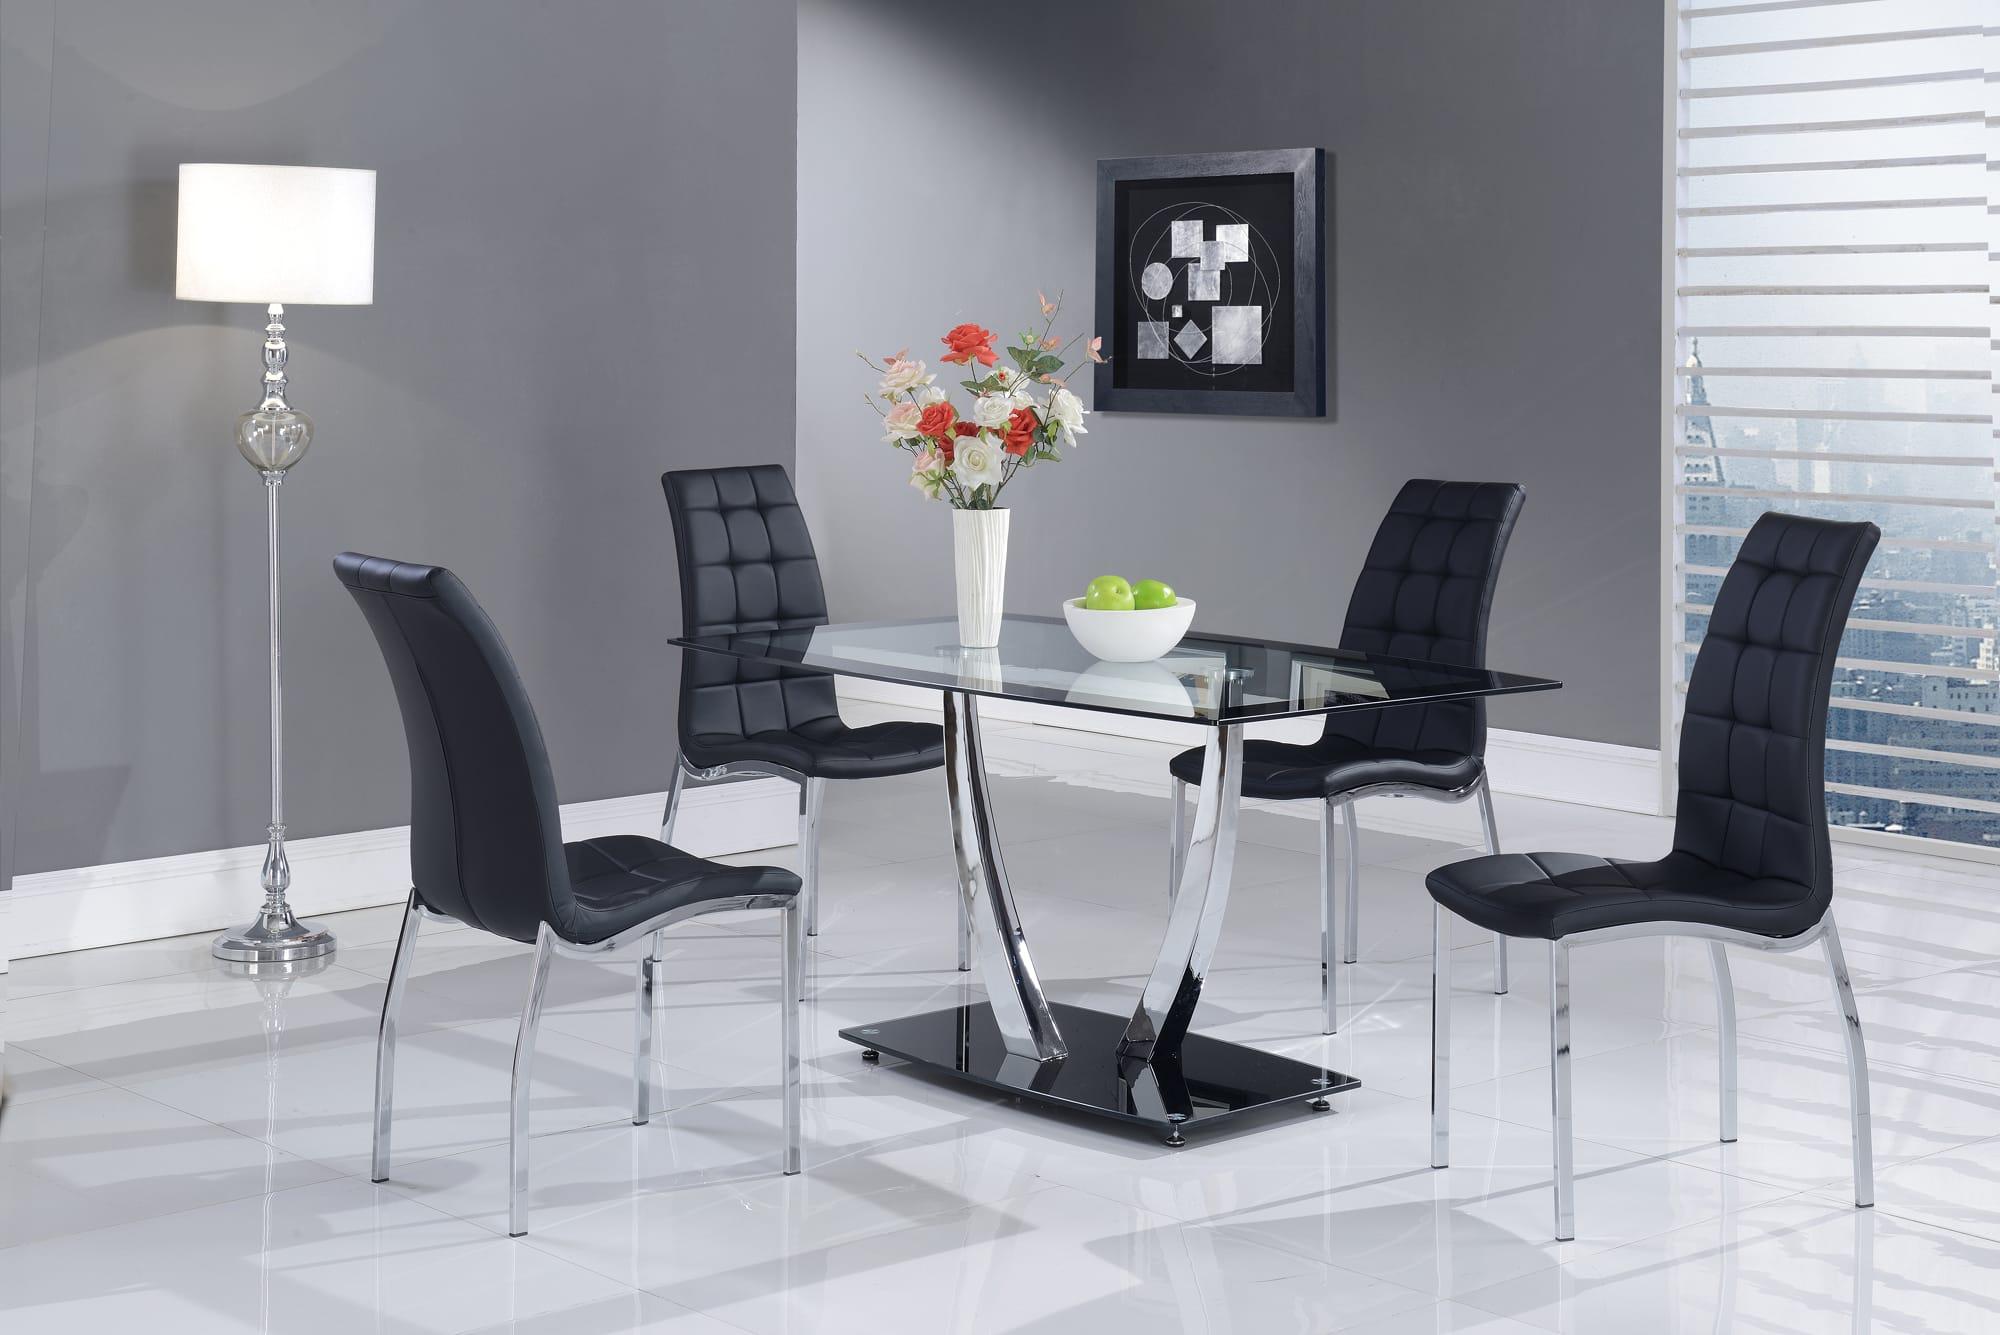 Dining Table D716DT ChromeBlack Stripe Glass by Global  : D716DT D716DC from futonland.com size 2000 x 1335 jpeg 1180kB